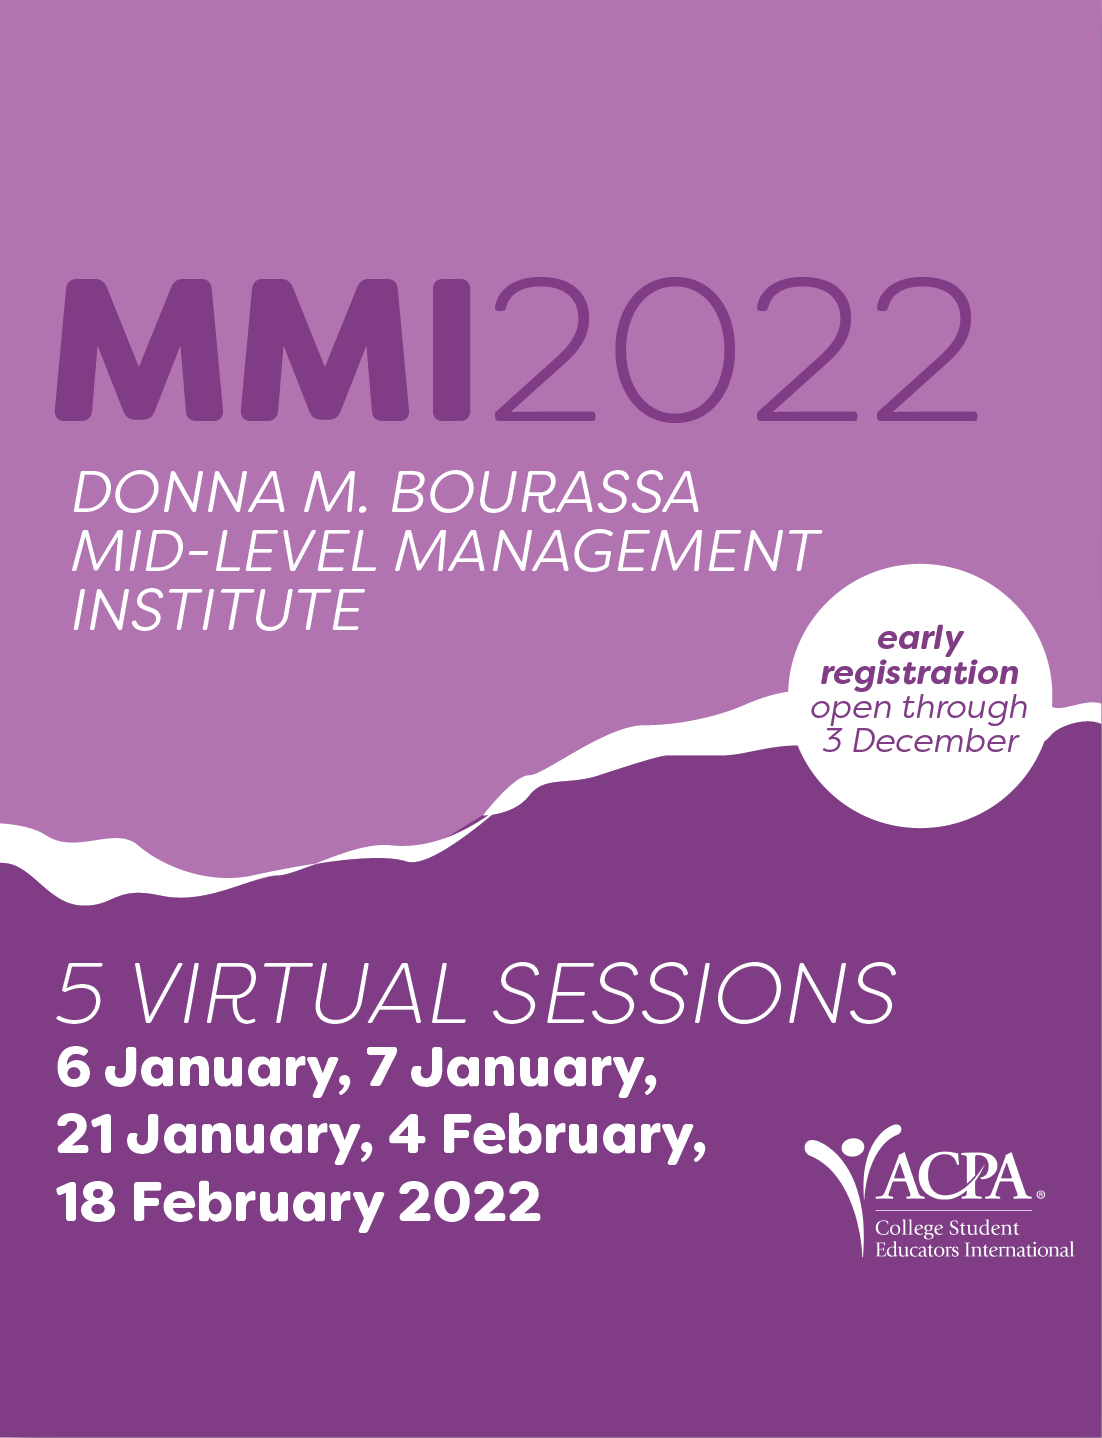 MMI2022. Donna M. Bourassa Mid-Level Management Institute. 5 Virtual Sessions 6 January, 7 January, 21 January, 4 February, 18 February 2022